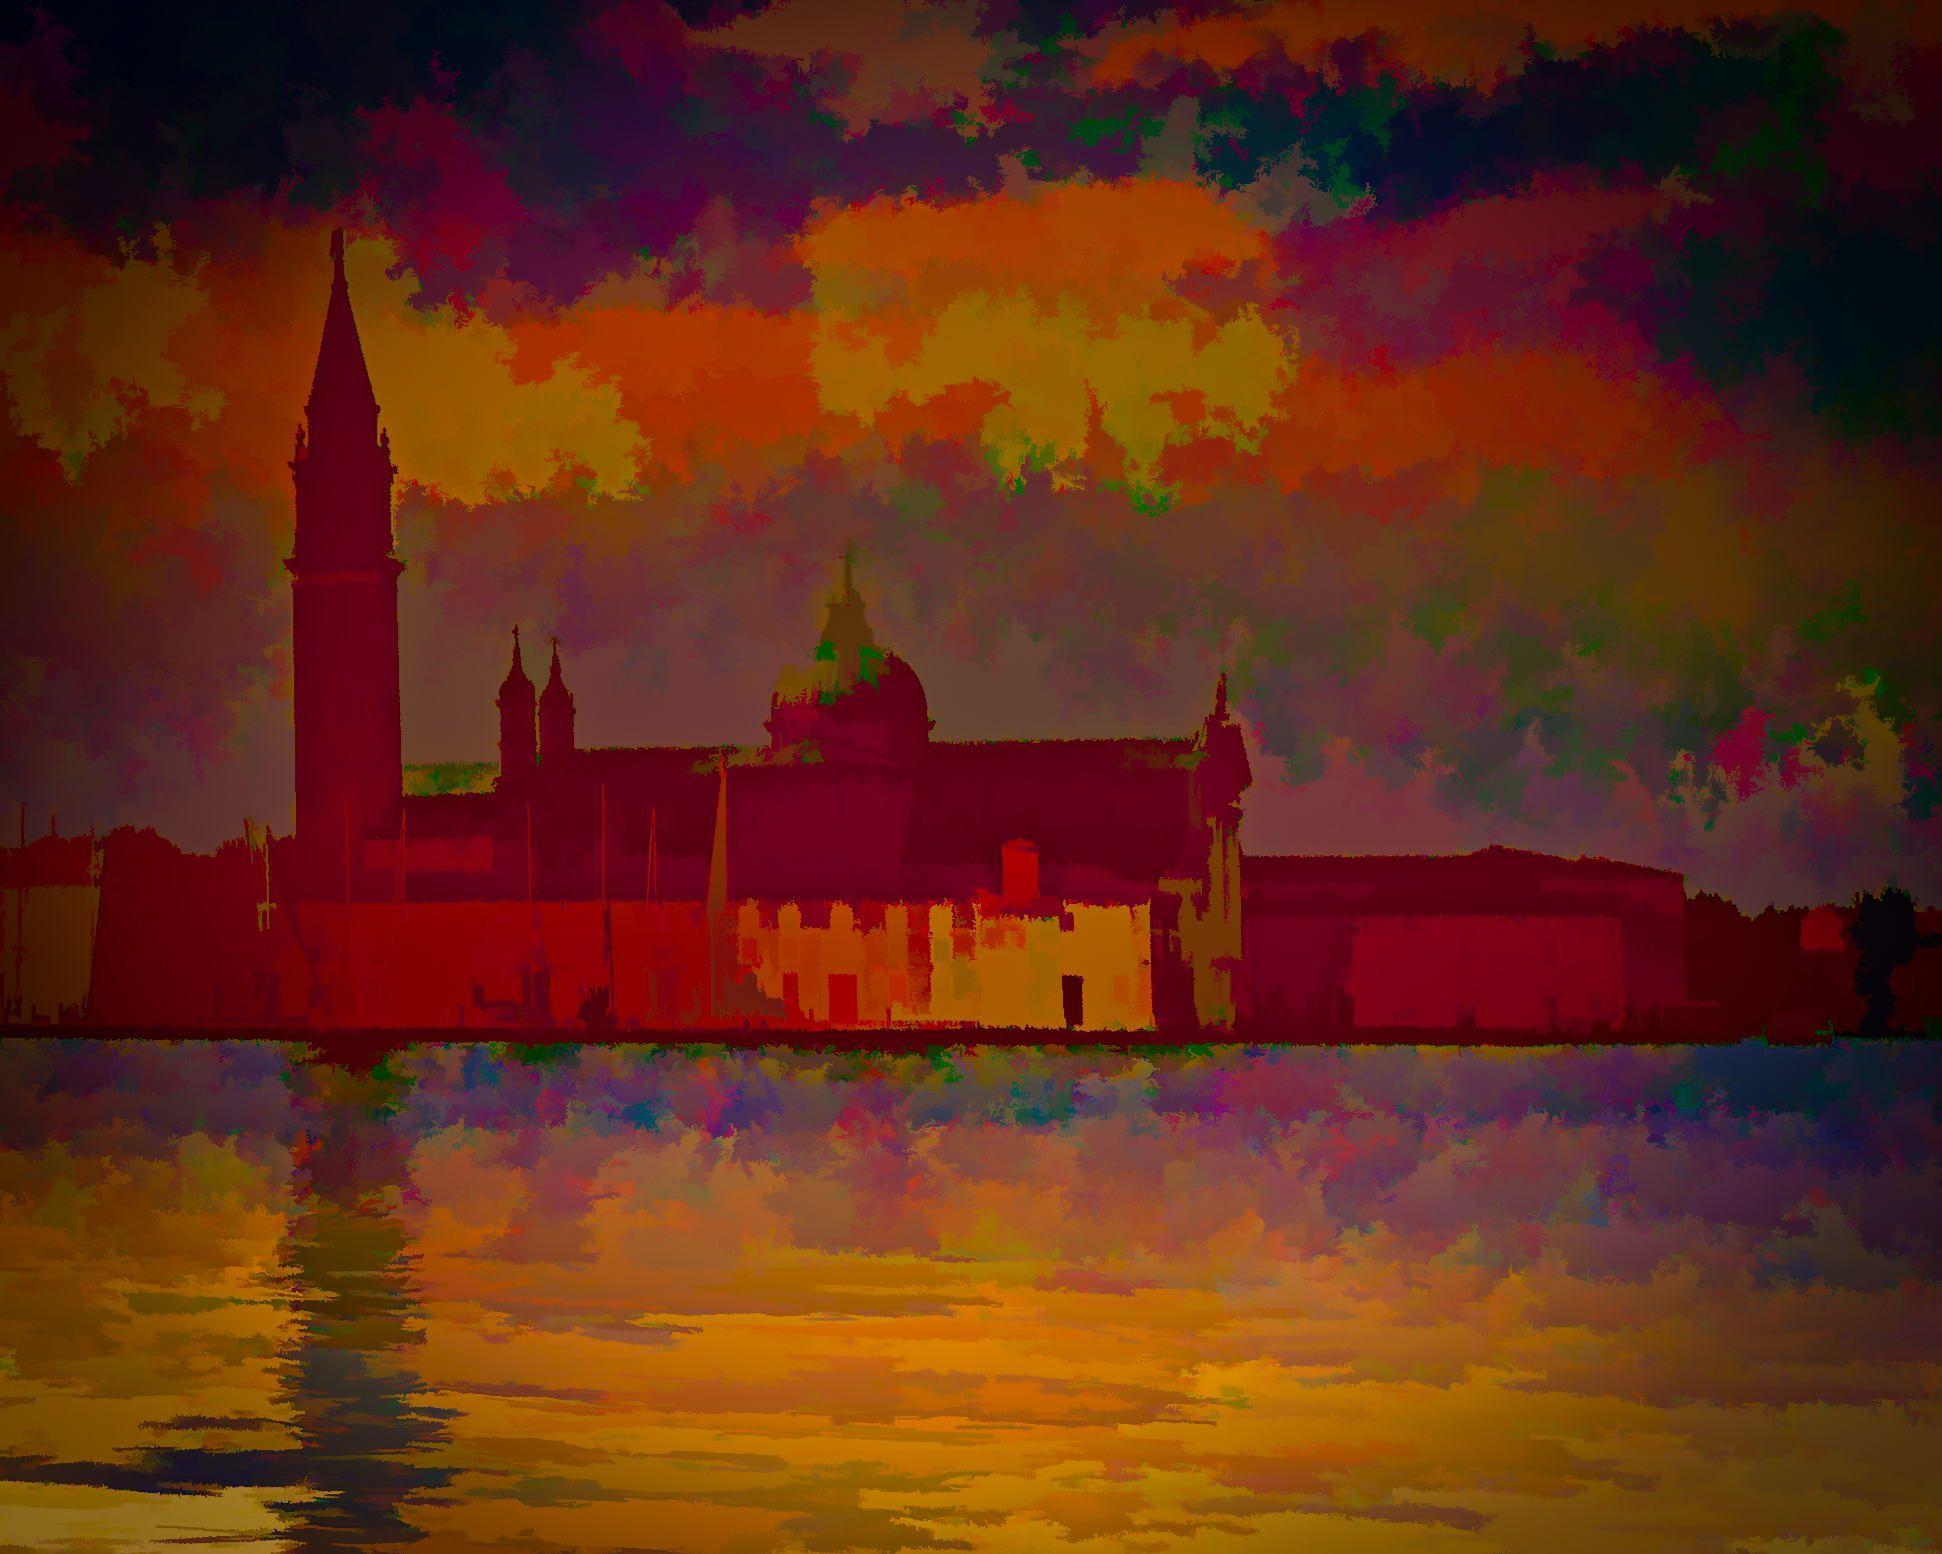 Photograph Impressions of San Giorgio Maggiore at Dusk by Bob Hartmann on 500px